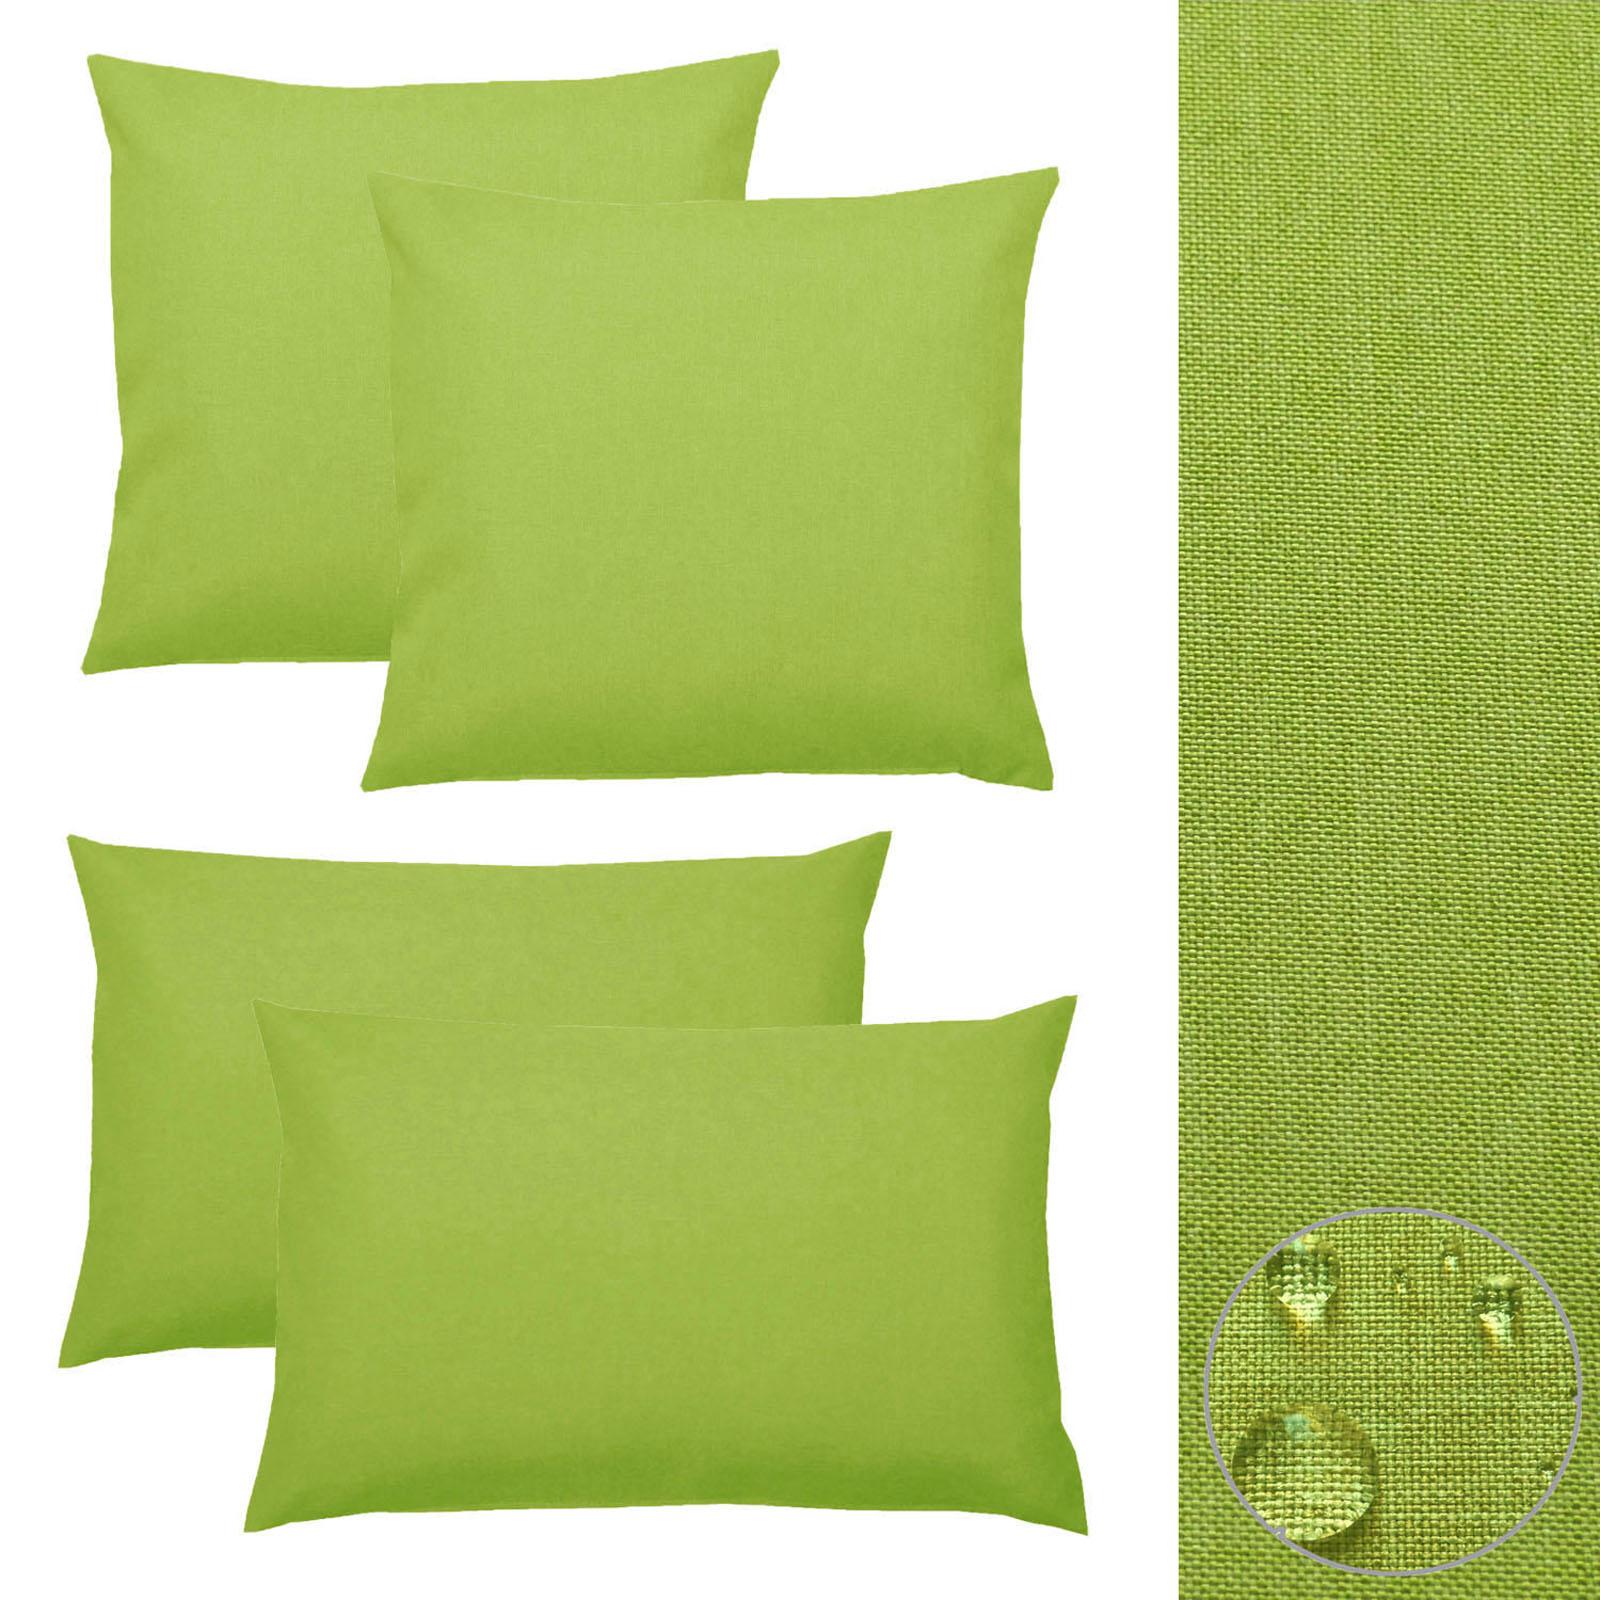 kissenh lle 2 st silver leinen optik kissenbezug 40x40 50x50 40x60 sofa kissen ebay. Black Bedroom Furniture Sets. Home Design Ideas